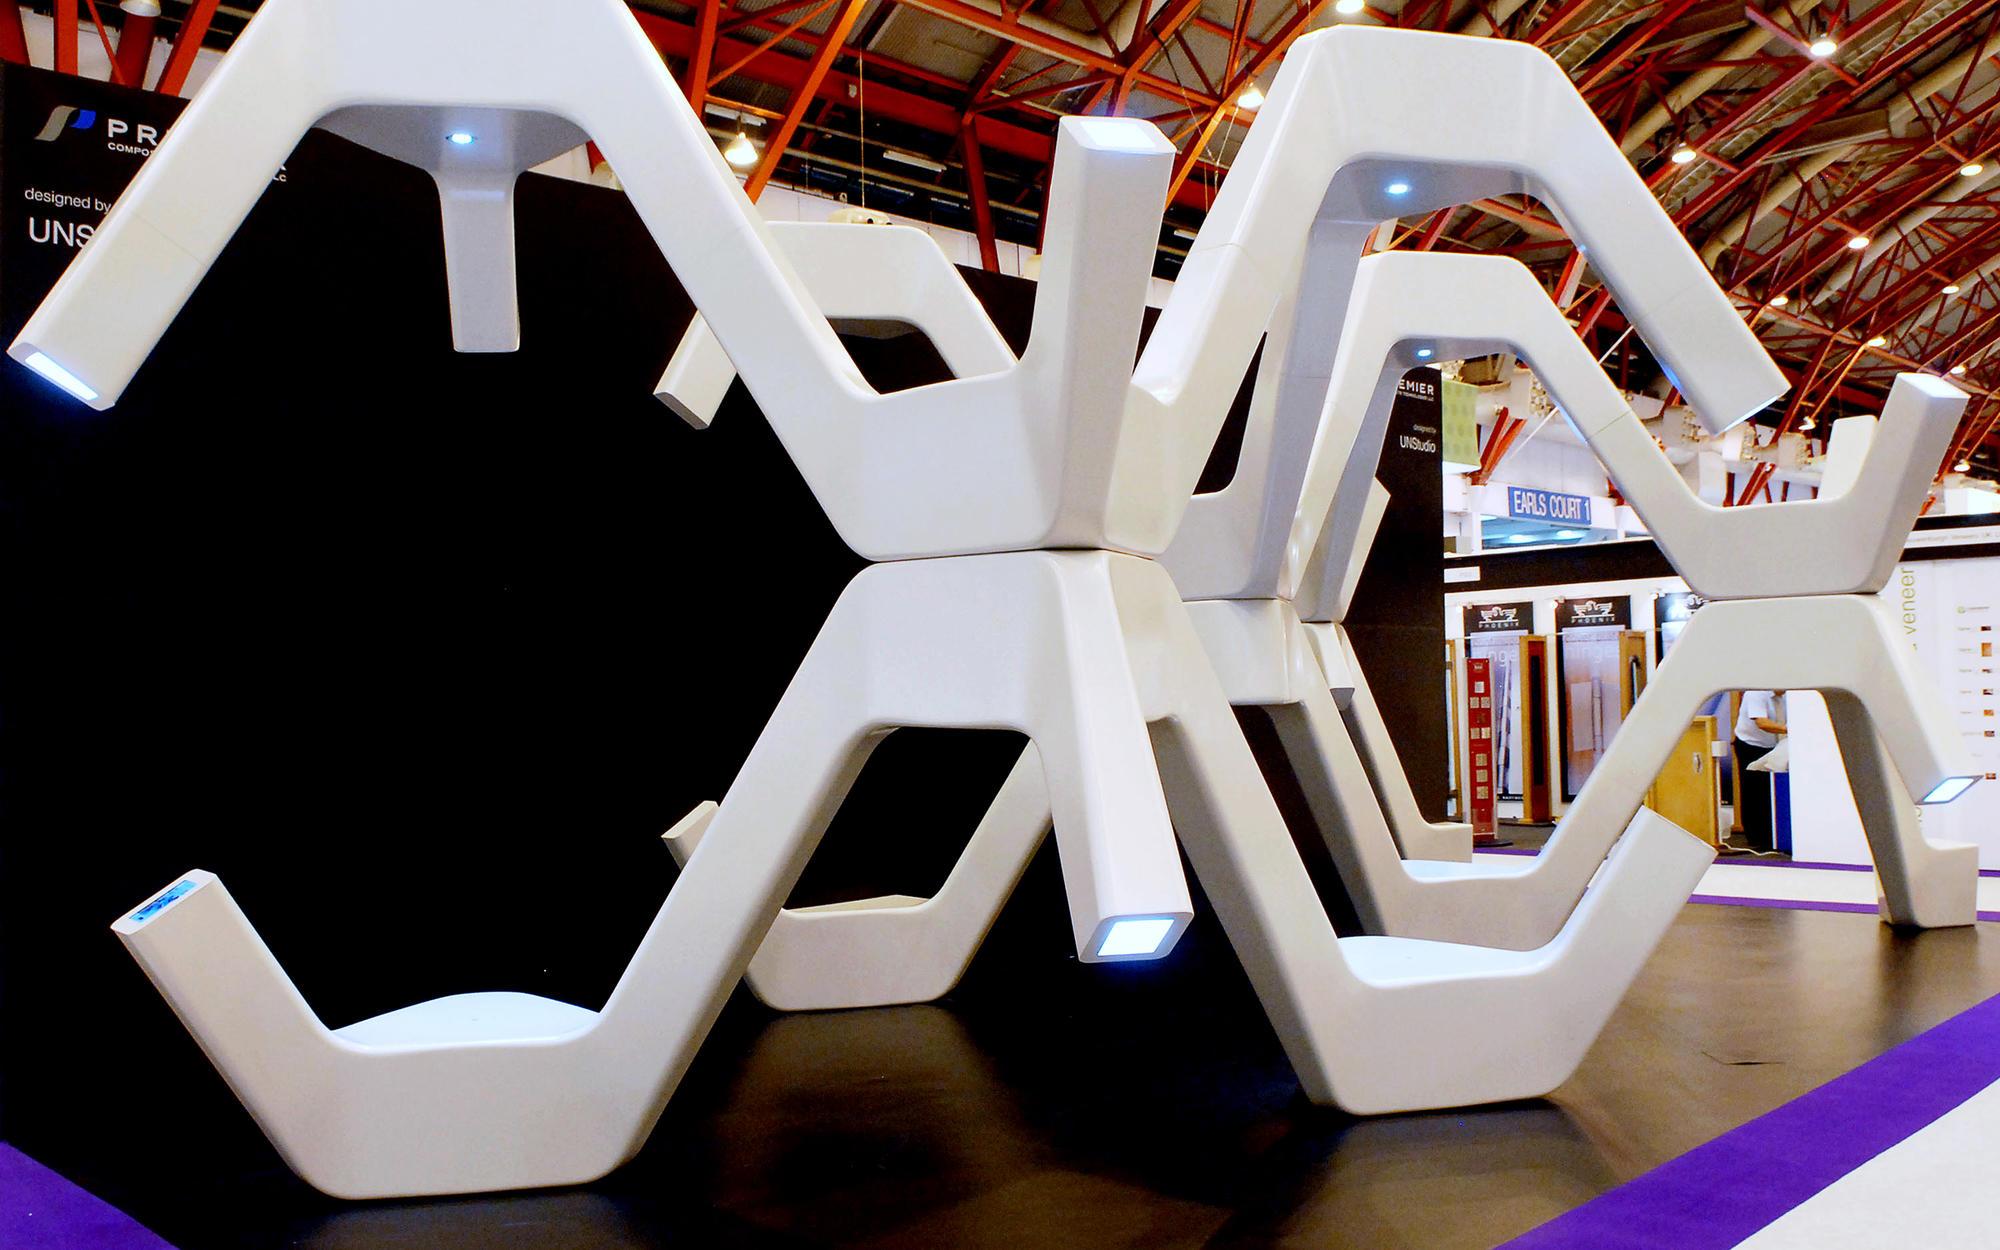 Modular fabrication unstudio for Fabrication stand